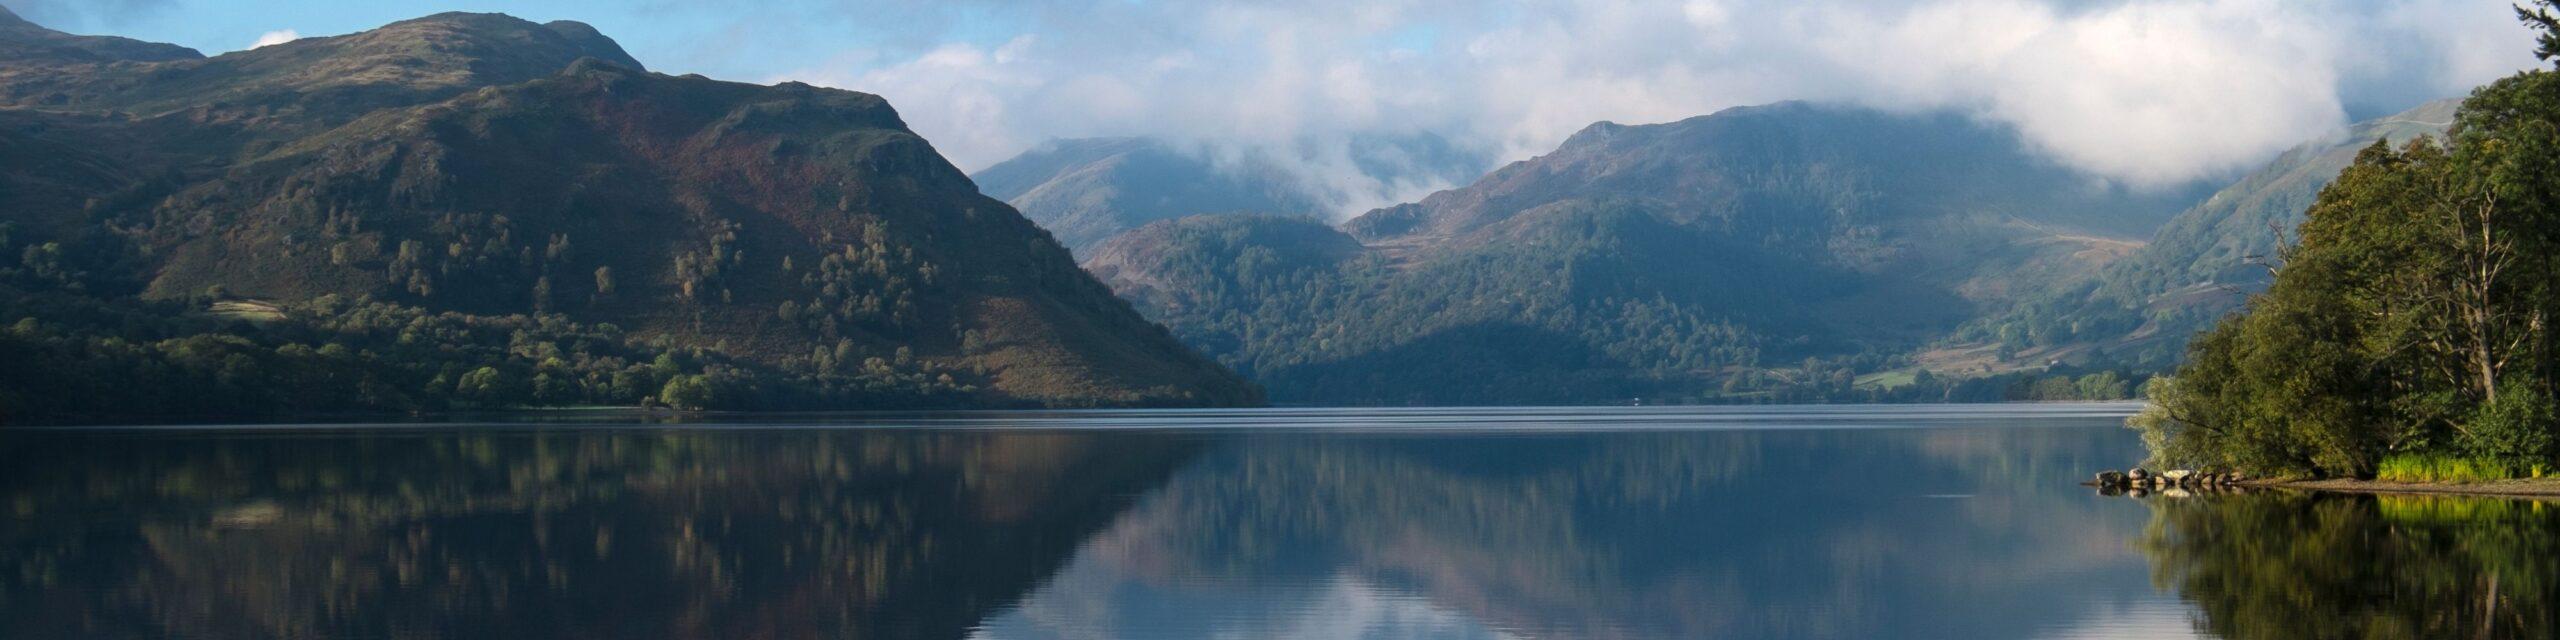 Ullswater, Cumbria - lake and mountain